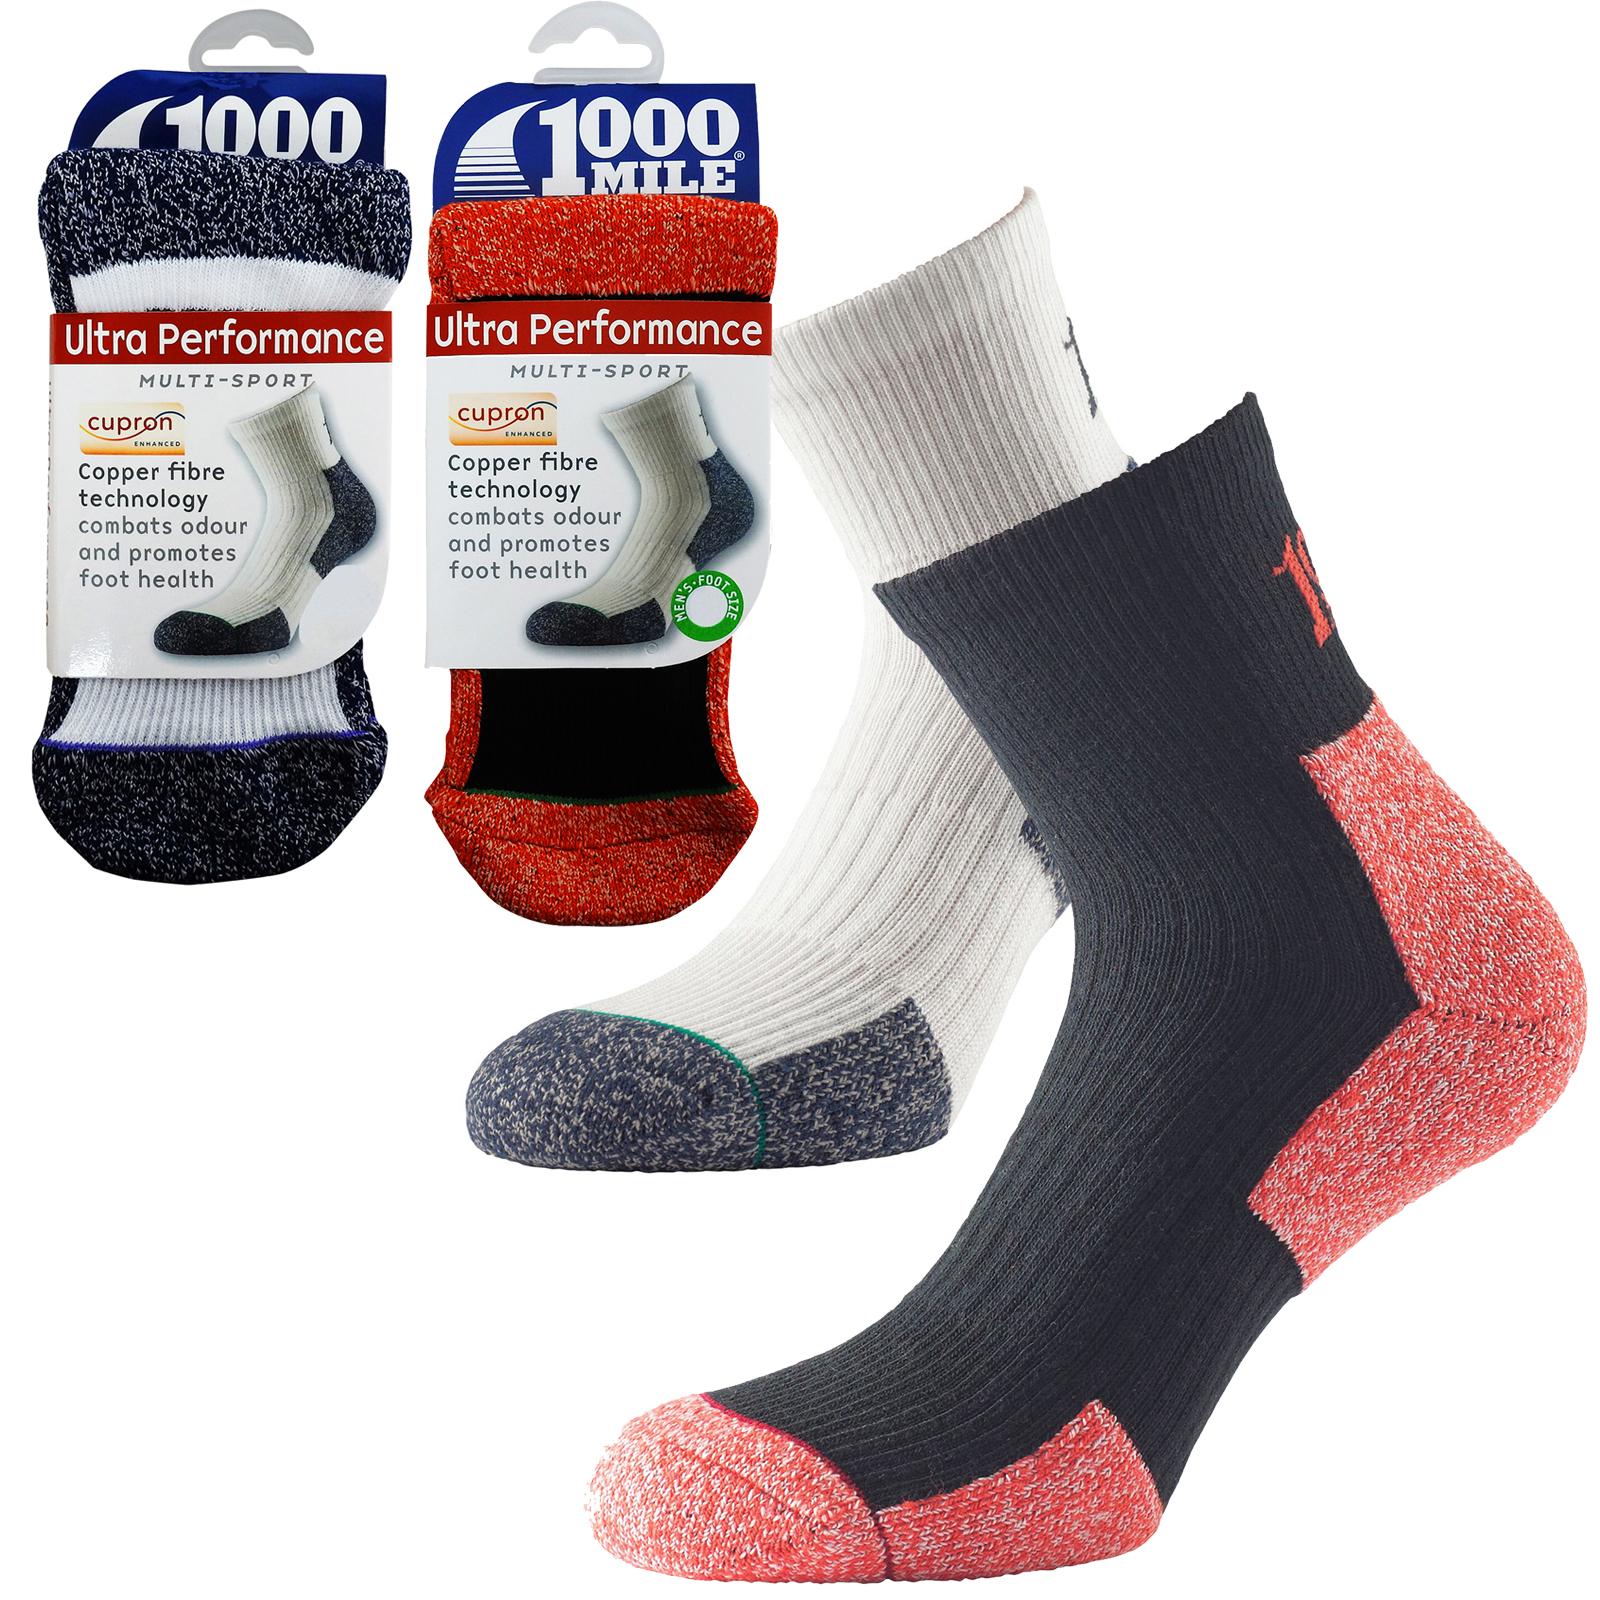 1000 Mile Premium Ultra Performance 3 Season Cupron Mens Walking Hiking Socks